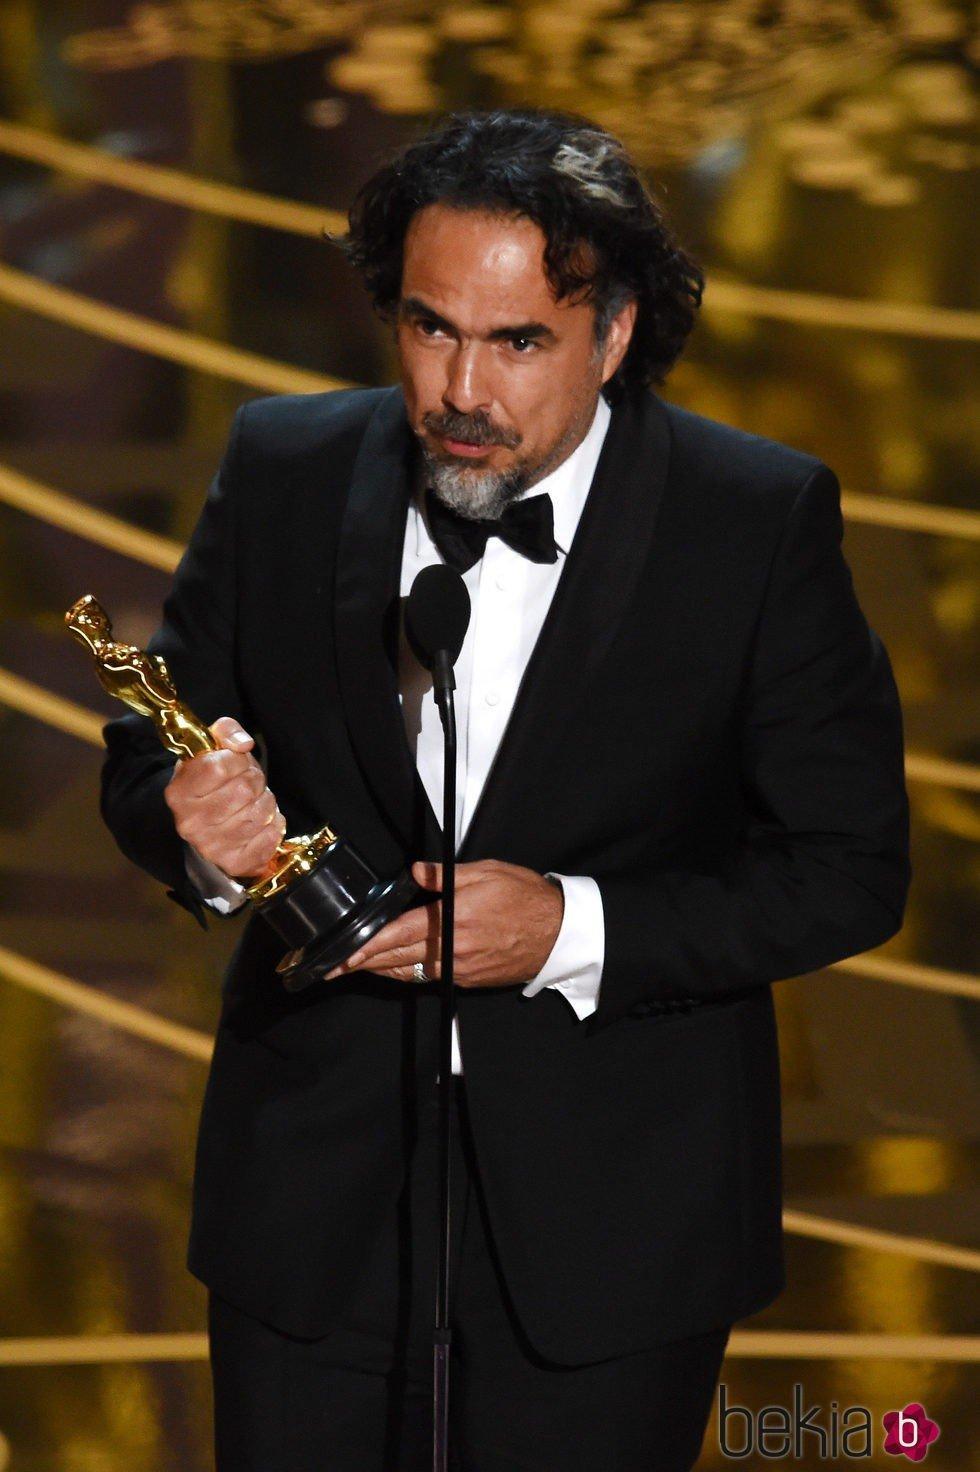 Alejandro Gonzalez Iñárritu recogiendo su Oscar 2016 a Mejor Director